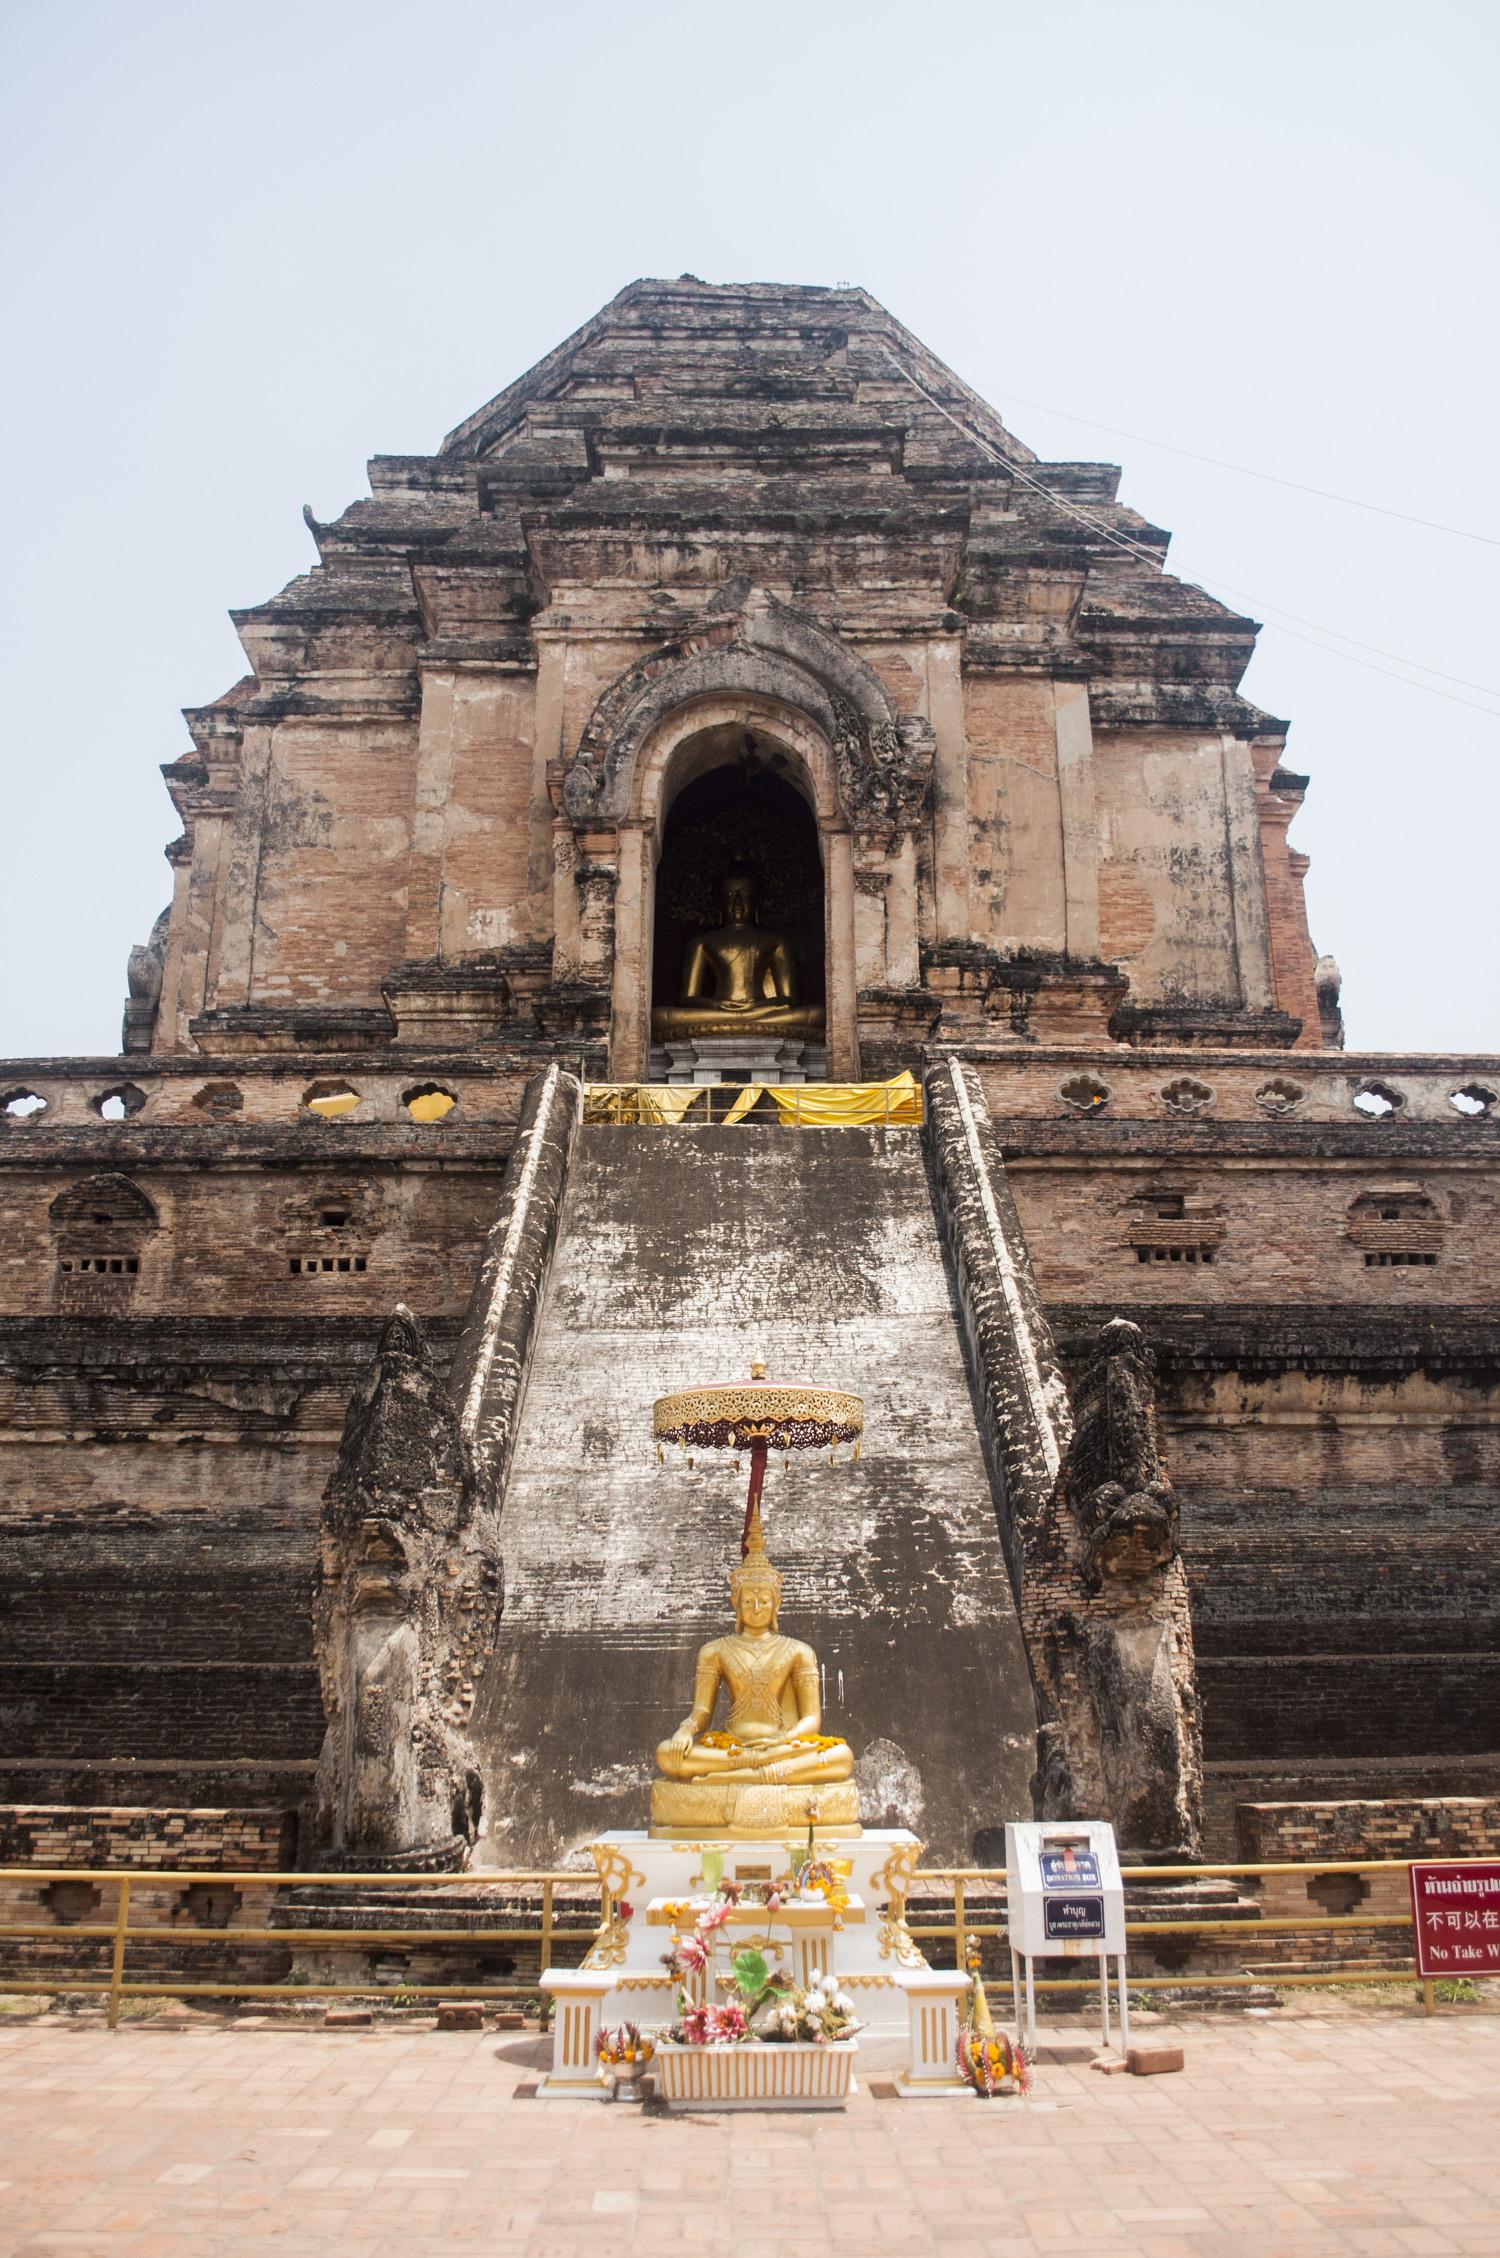 Wat Chedi Luang - 103 Road King Prajadhipok Phra Singh, Muang District, Chiang Mai, 50200, Thailand